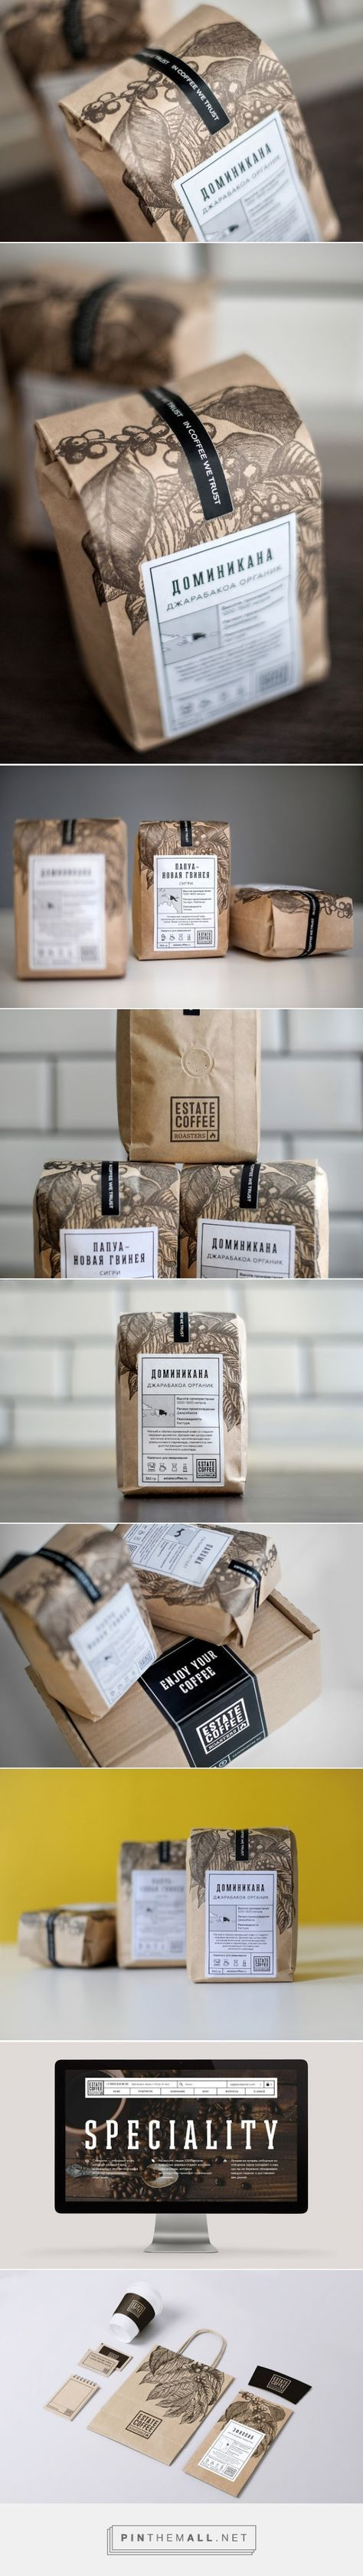 Estate Coffee Roasters packaging designed by AHEAD (Russia) - http://www.packagingoftheworld.com/2016/02/estate-coffee-roasters.html